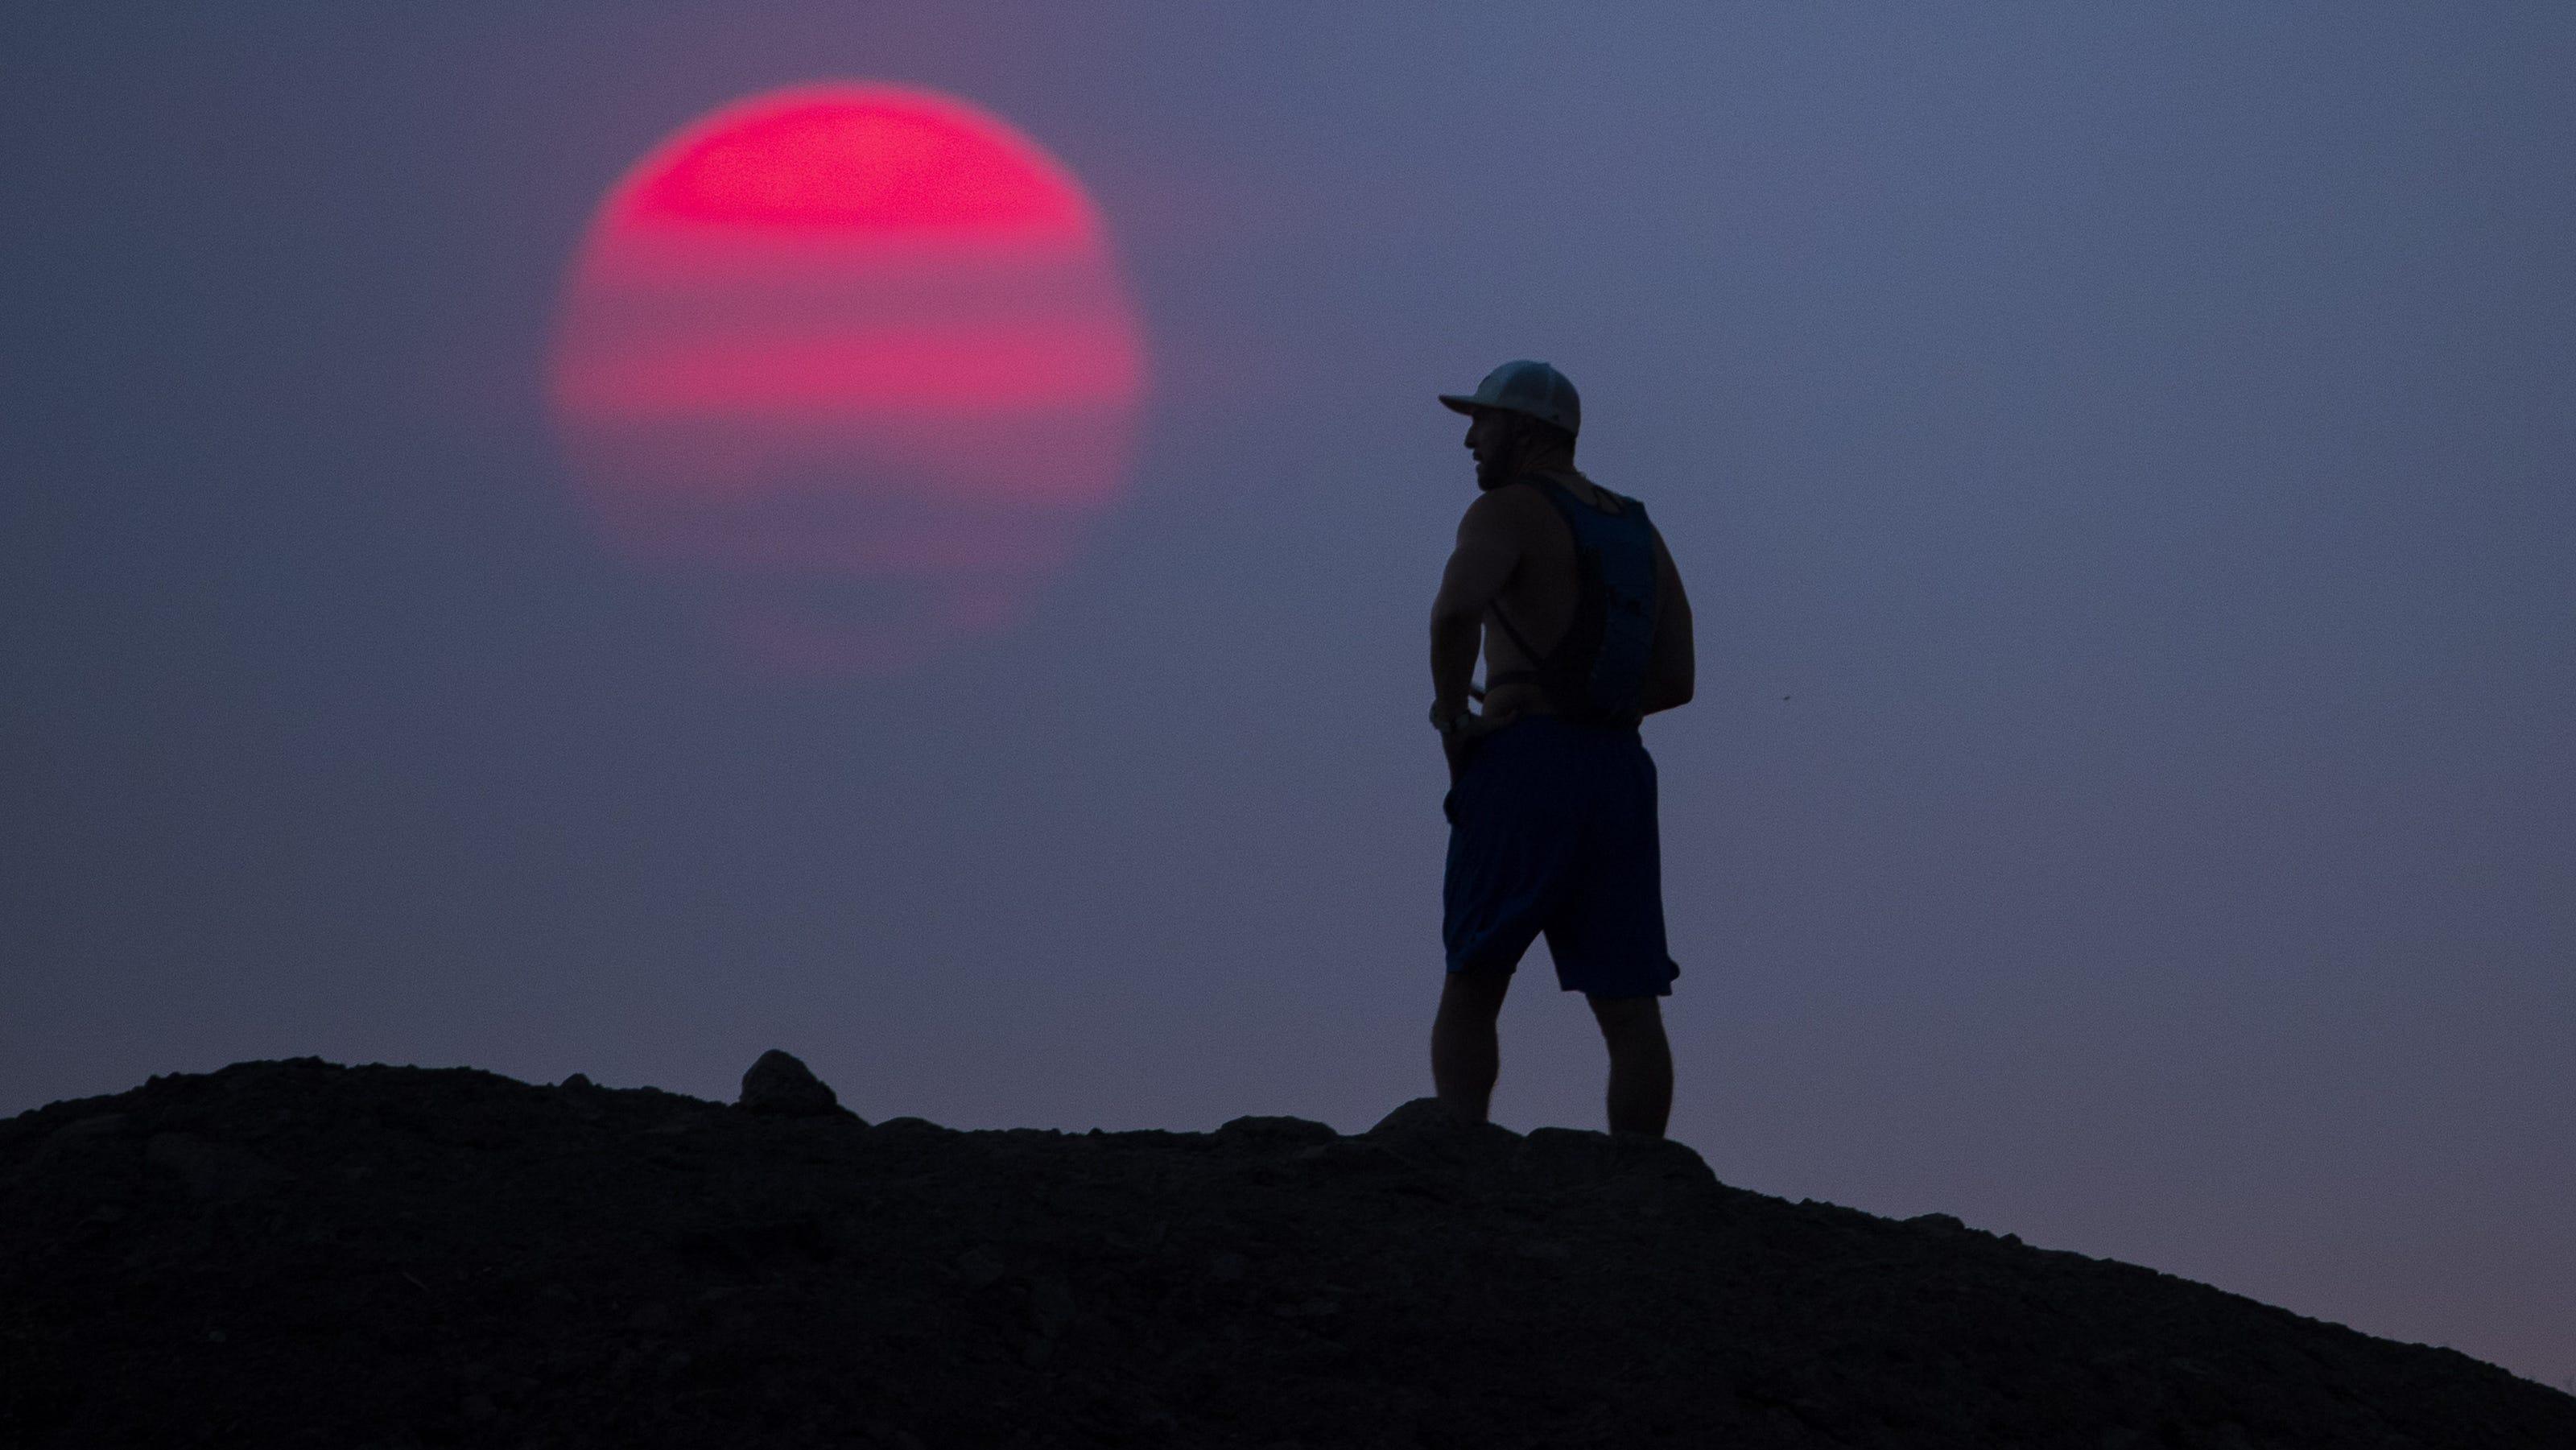 Phoenix reaches 118 degrees, breaks daily heat record